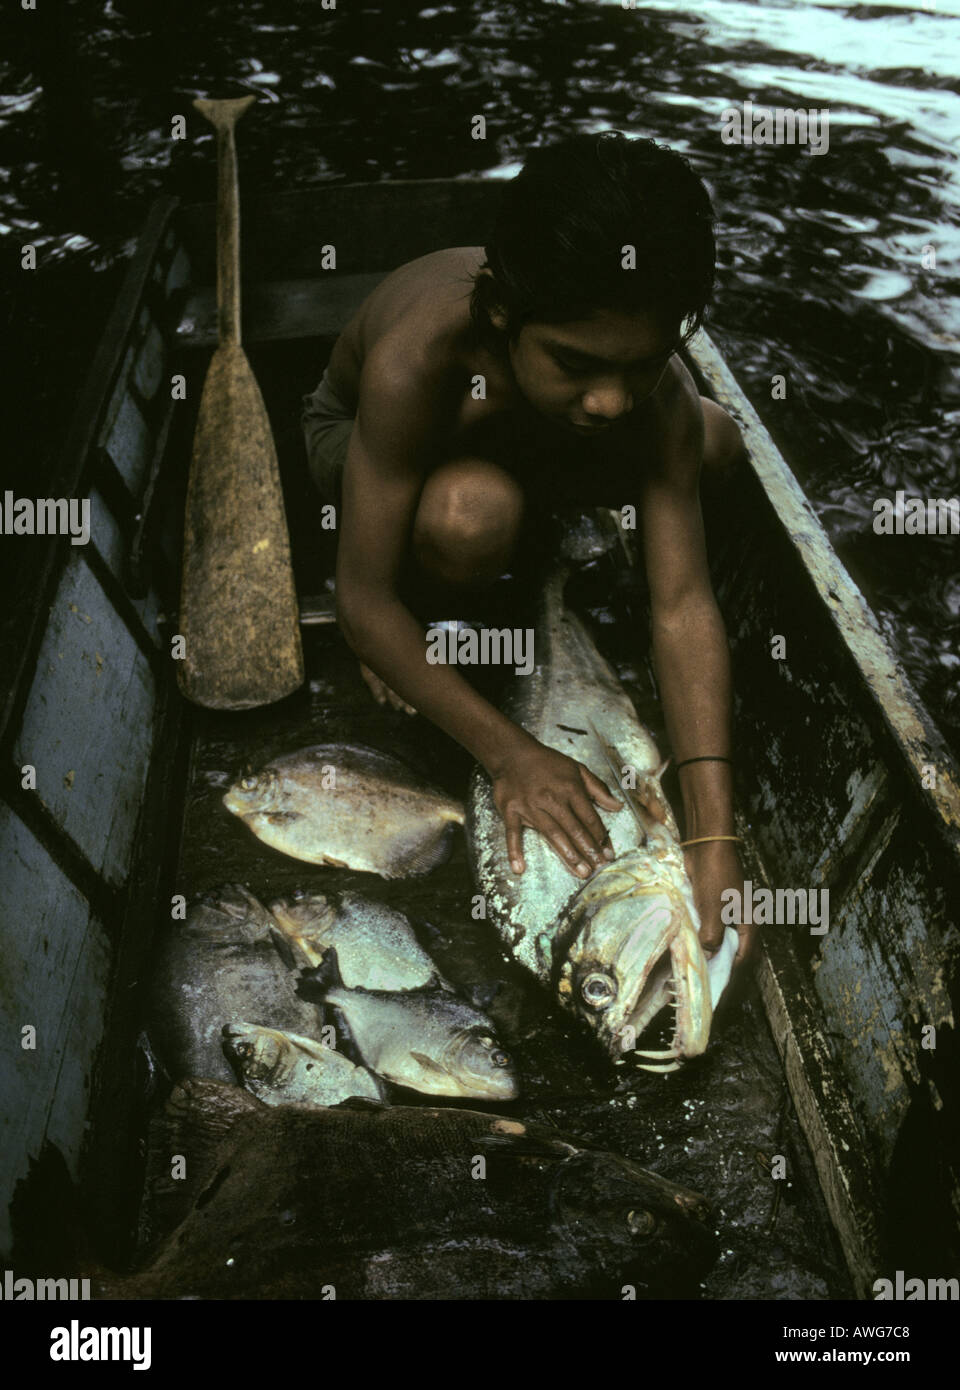 Amerindian boy with fish catch Mazaruni River Guyana - Stock Image